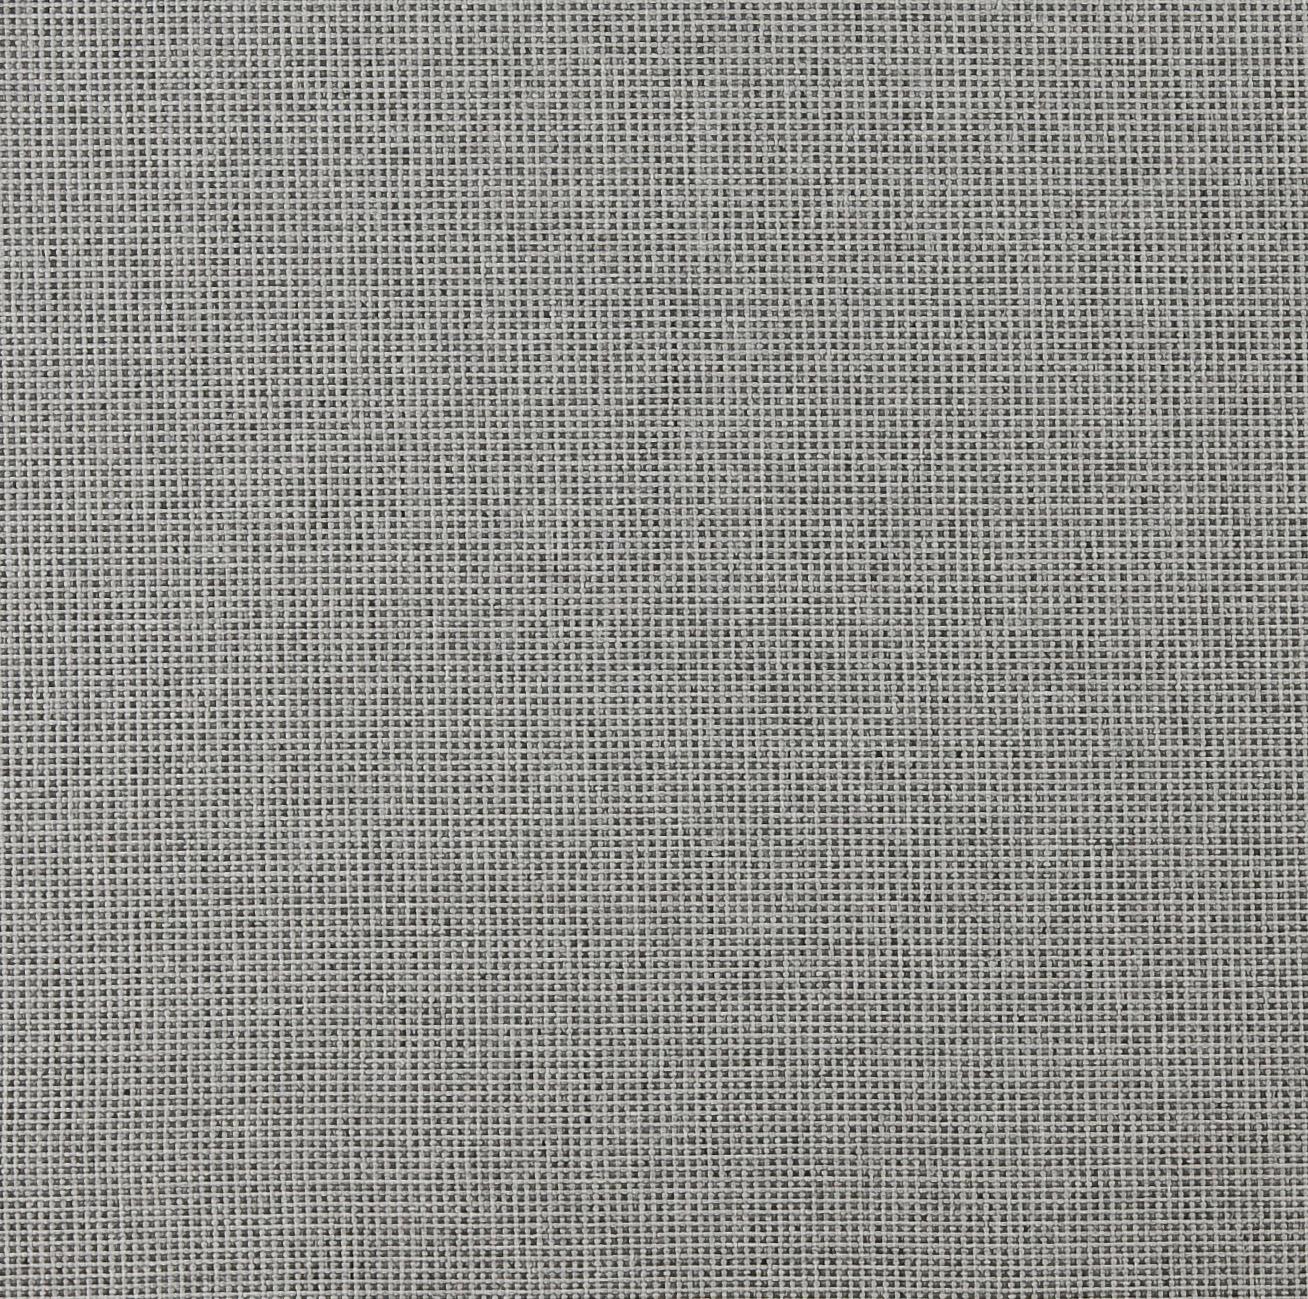 Platinum Grey Checkered Weave Tweed Upholstery Fabric